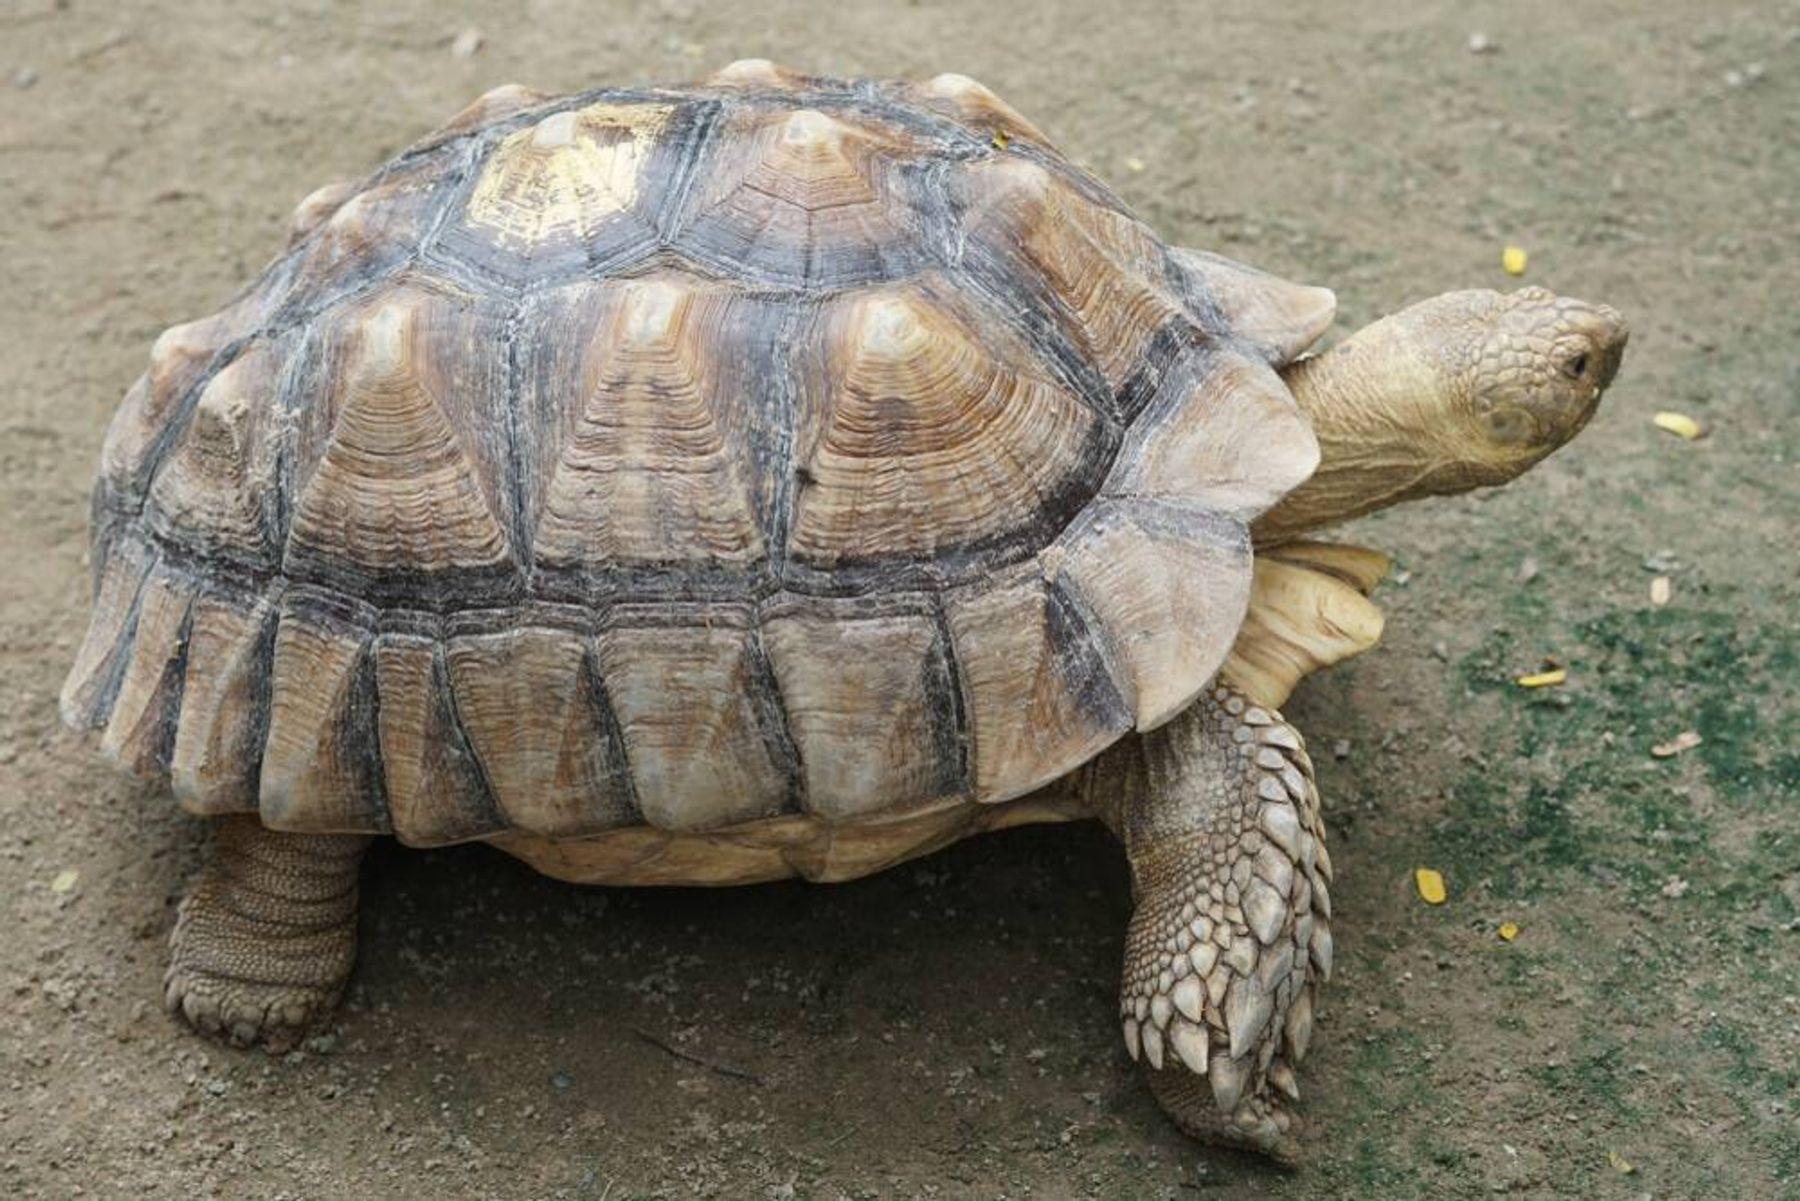 Kura kura Sulcata Reptil Lucu nan Langka